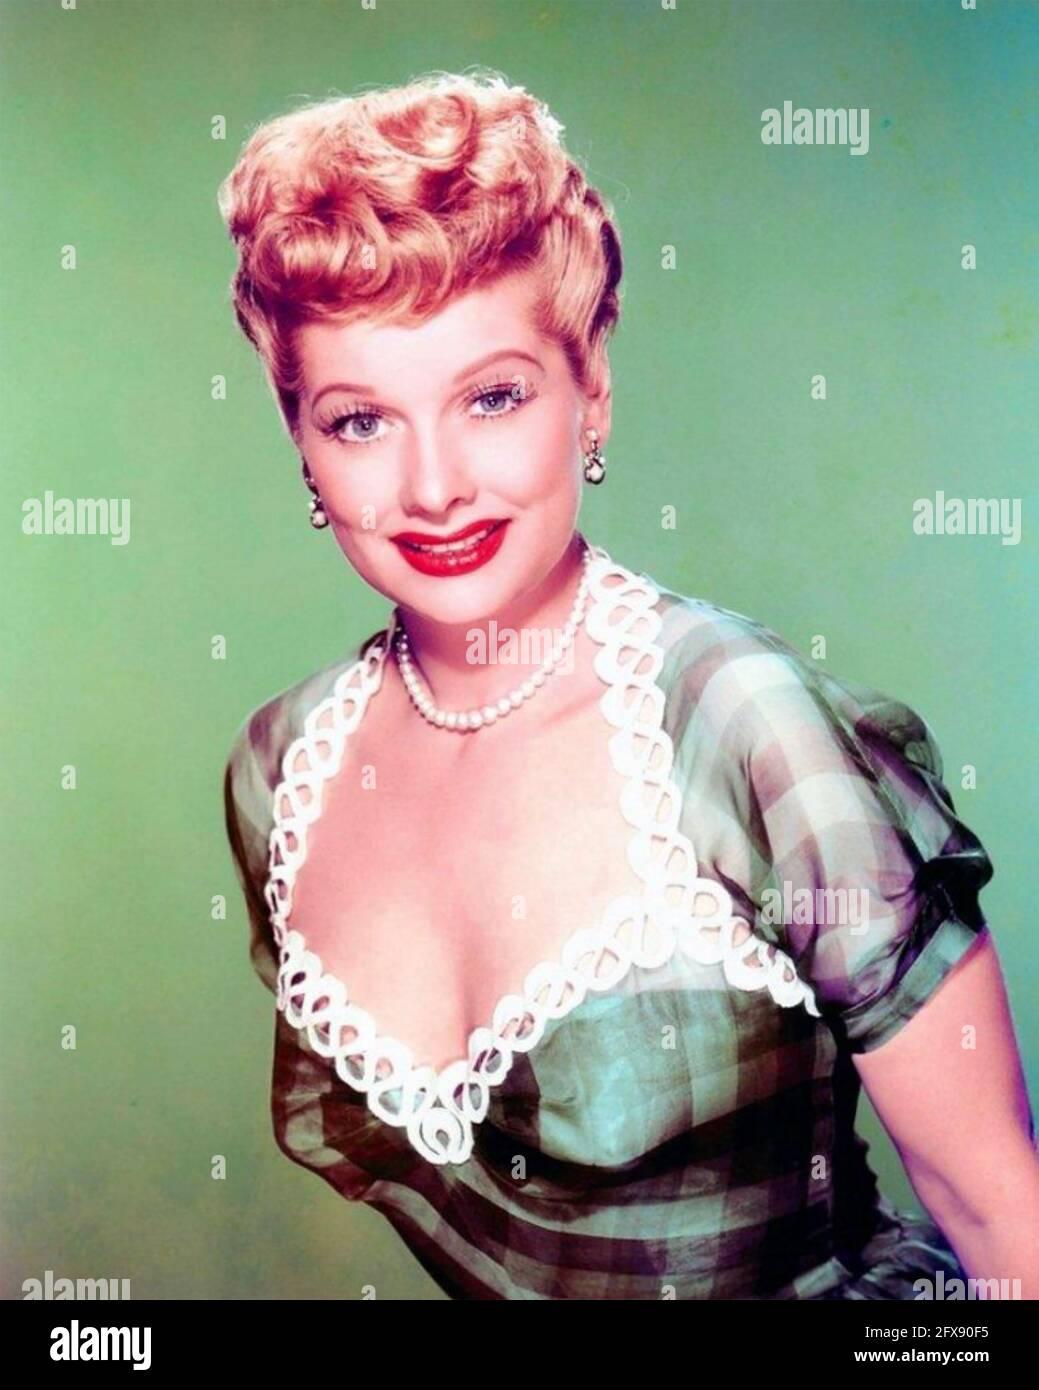 LUCILLE BALL (1911-1989) actrice et productrice américaine vers 1955 Banque D'Images